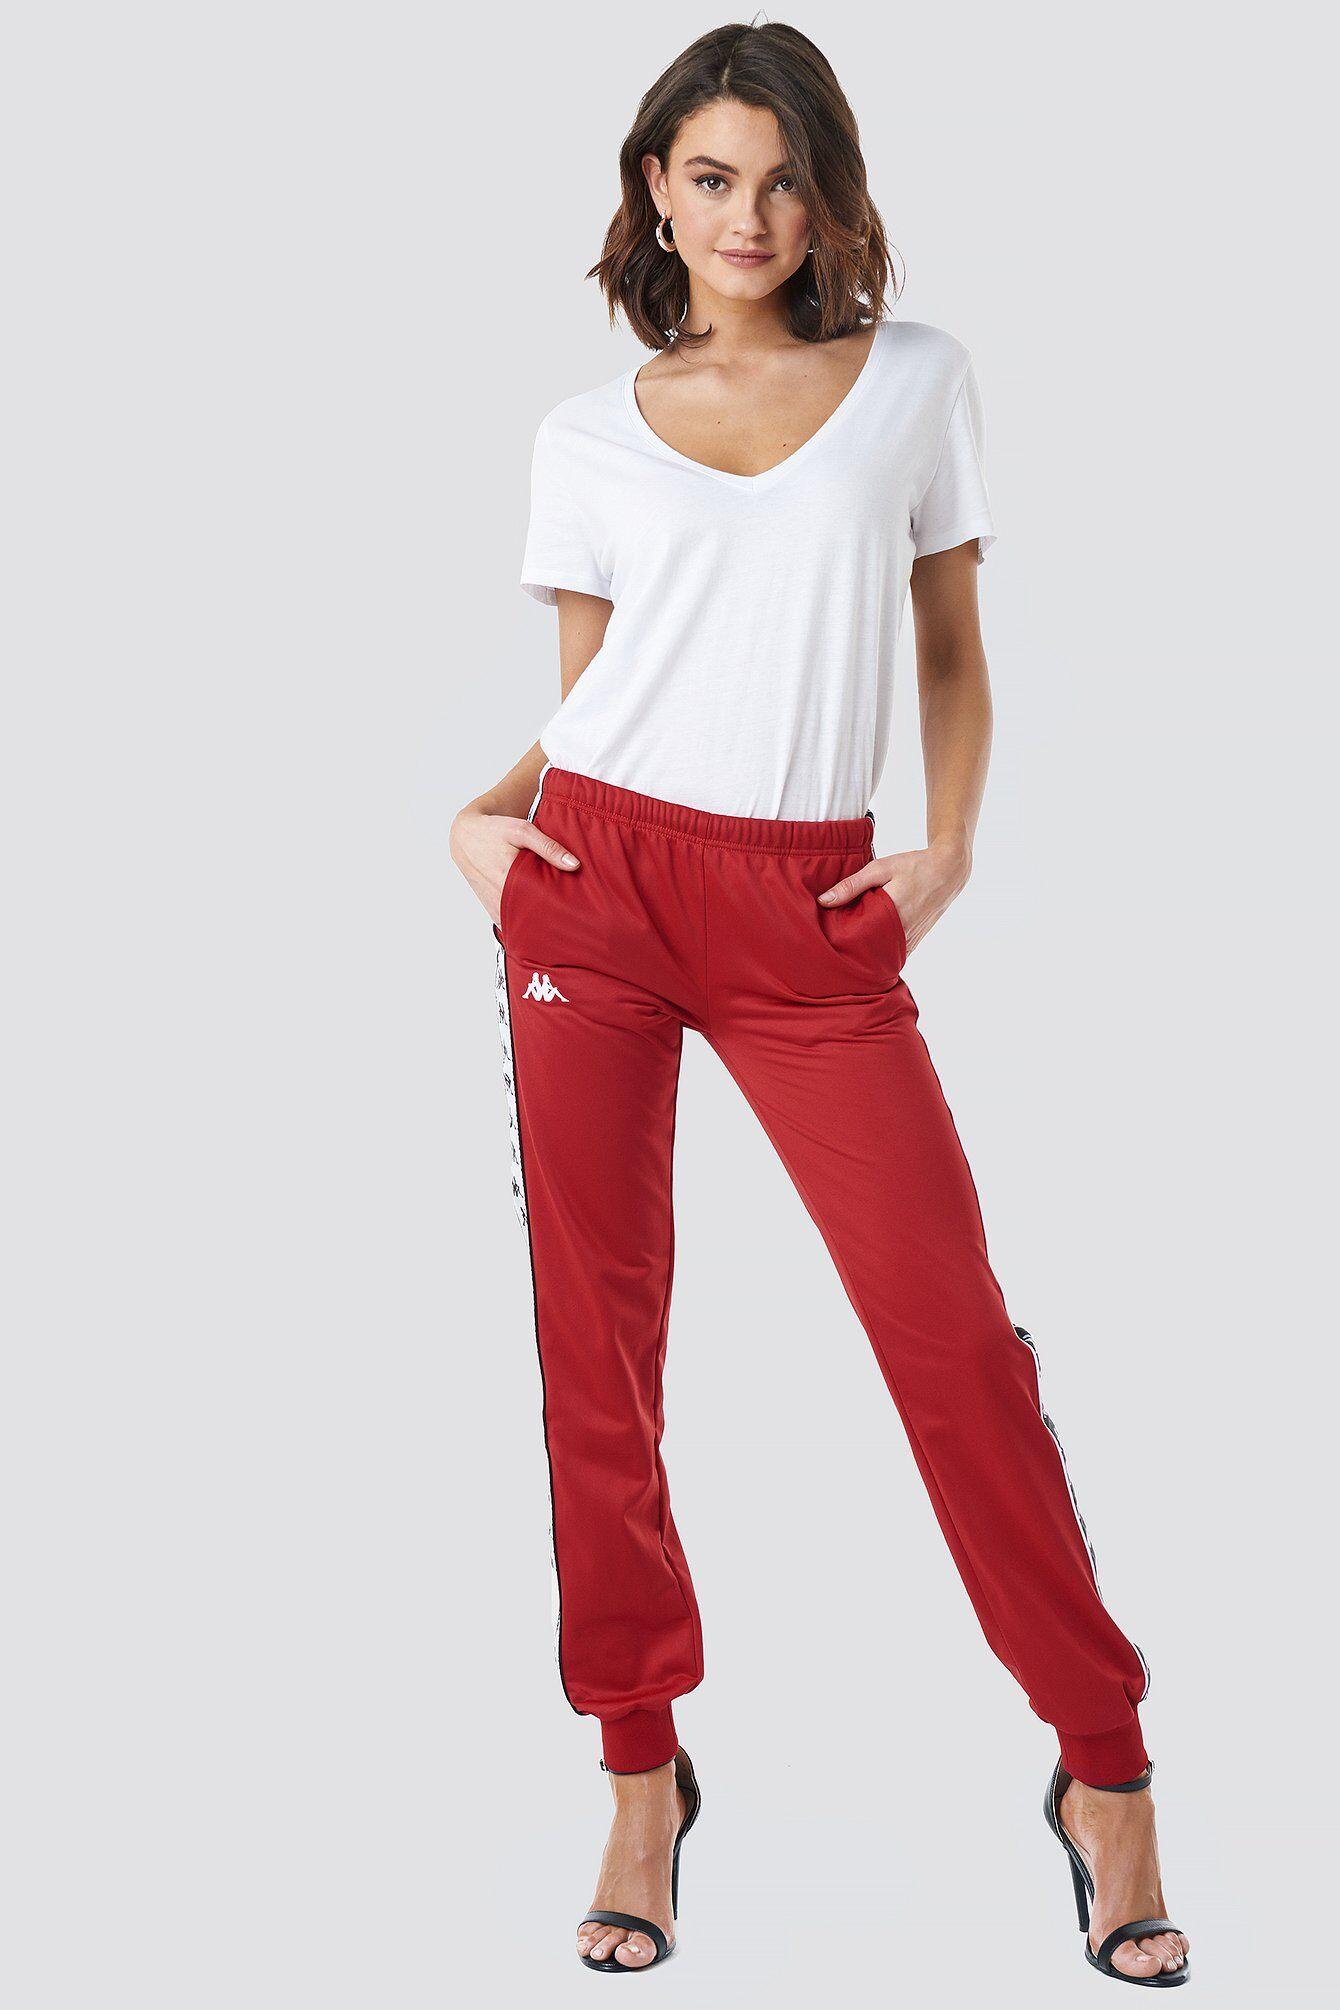 Kappa Wrastoria Banda Pants - Red  - Size: Small